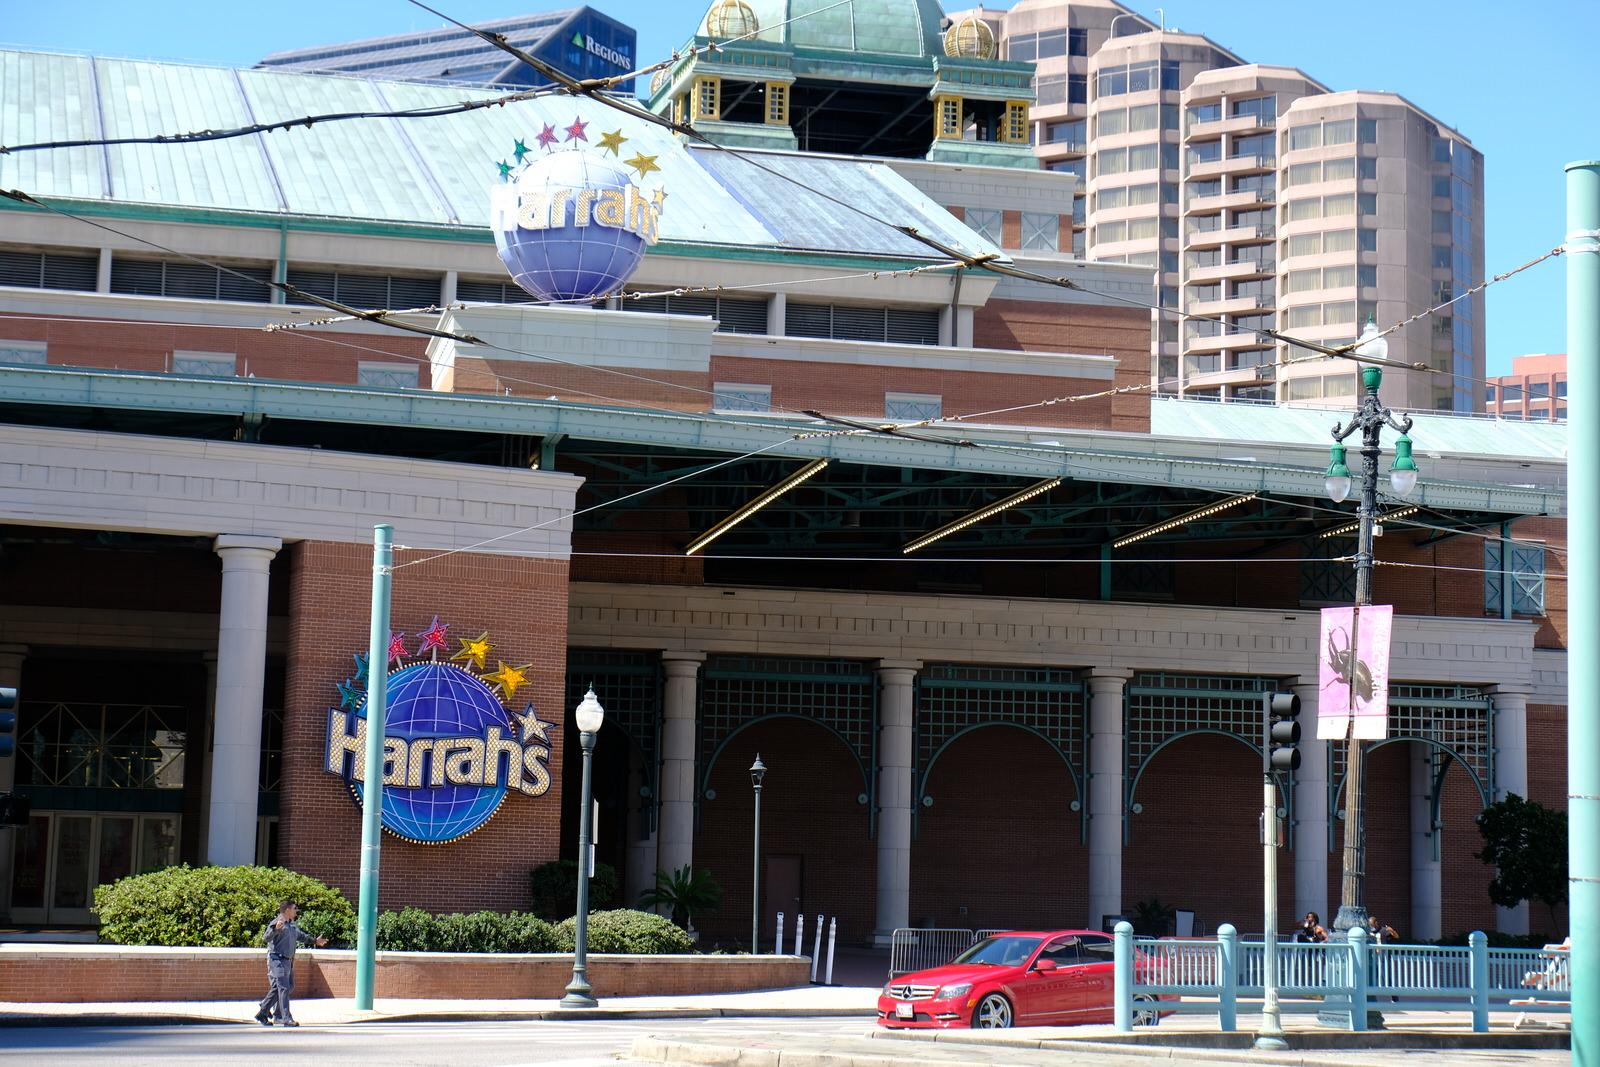 Harrah's casino in downtown New Orleans, Louisiana.